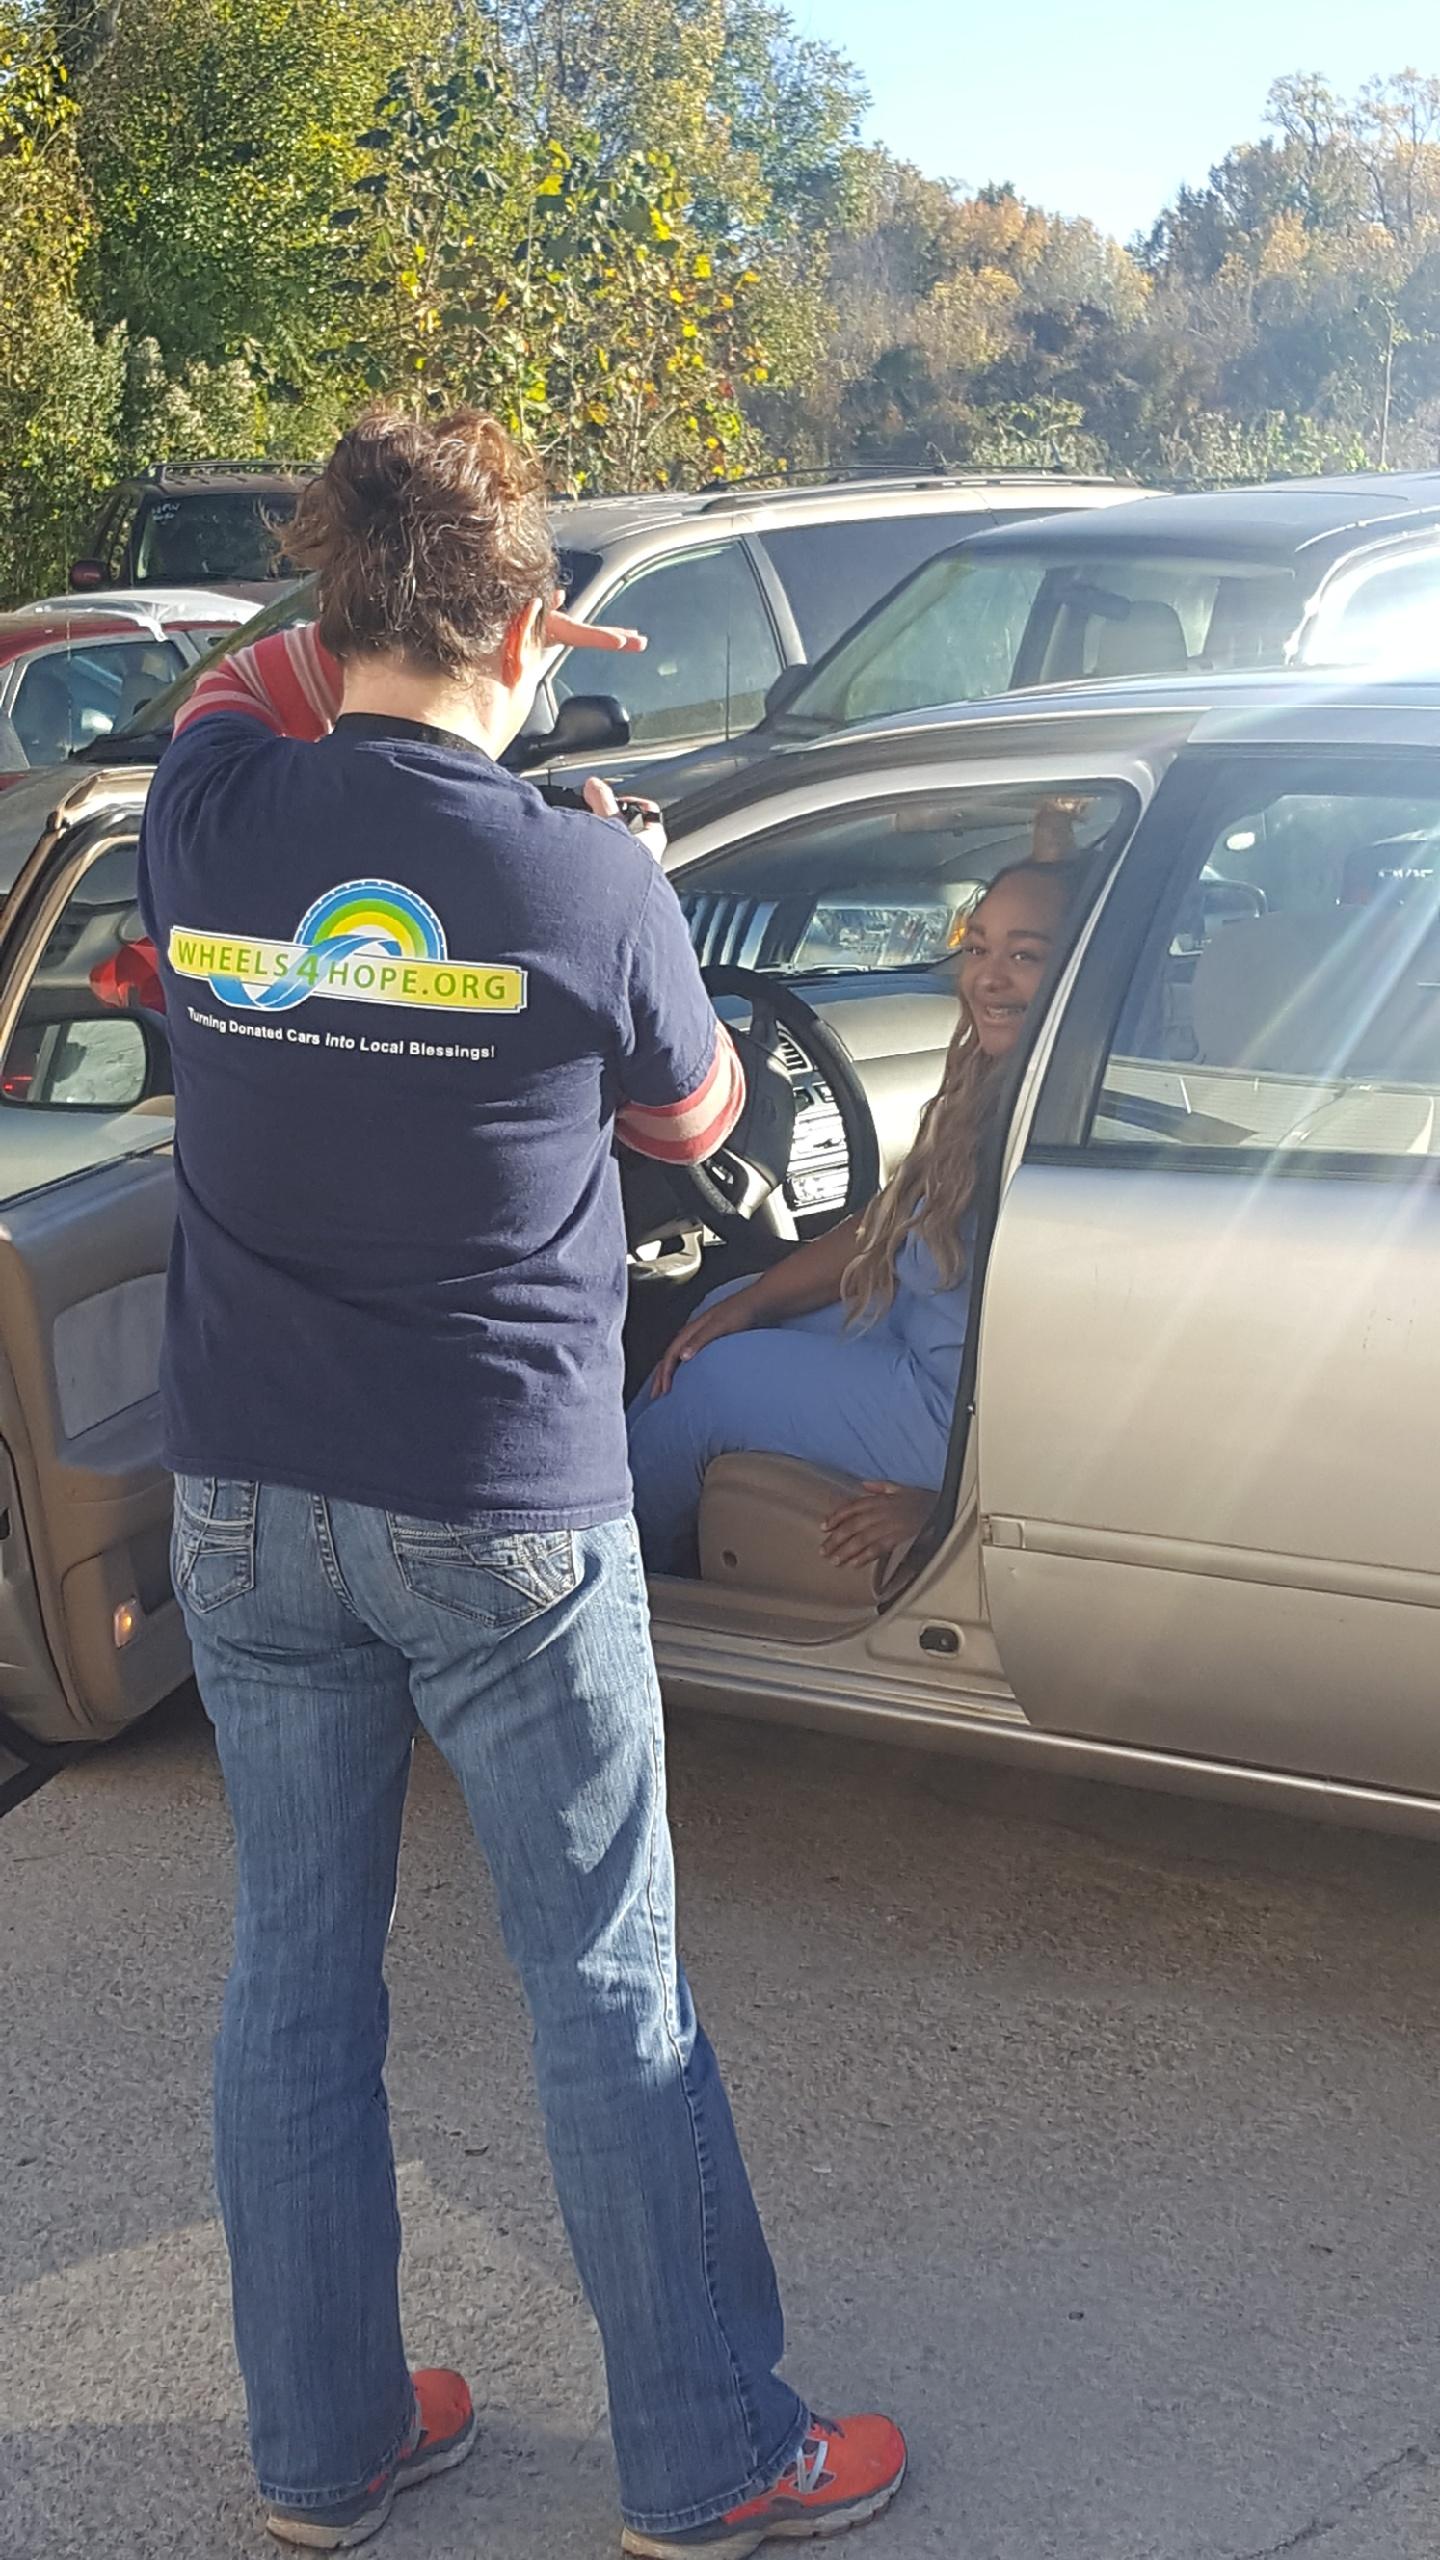 Amanda S. Car Blessing - 11-20-17 (2)